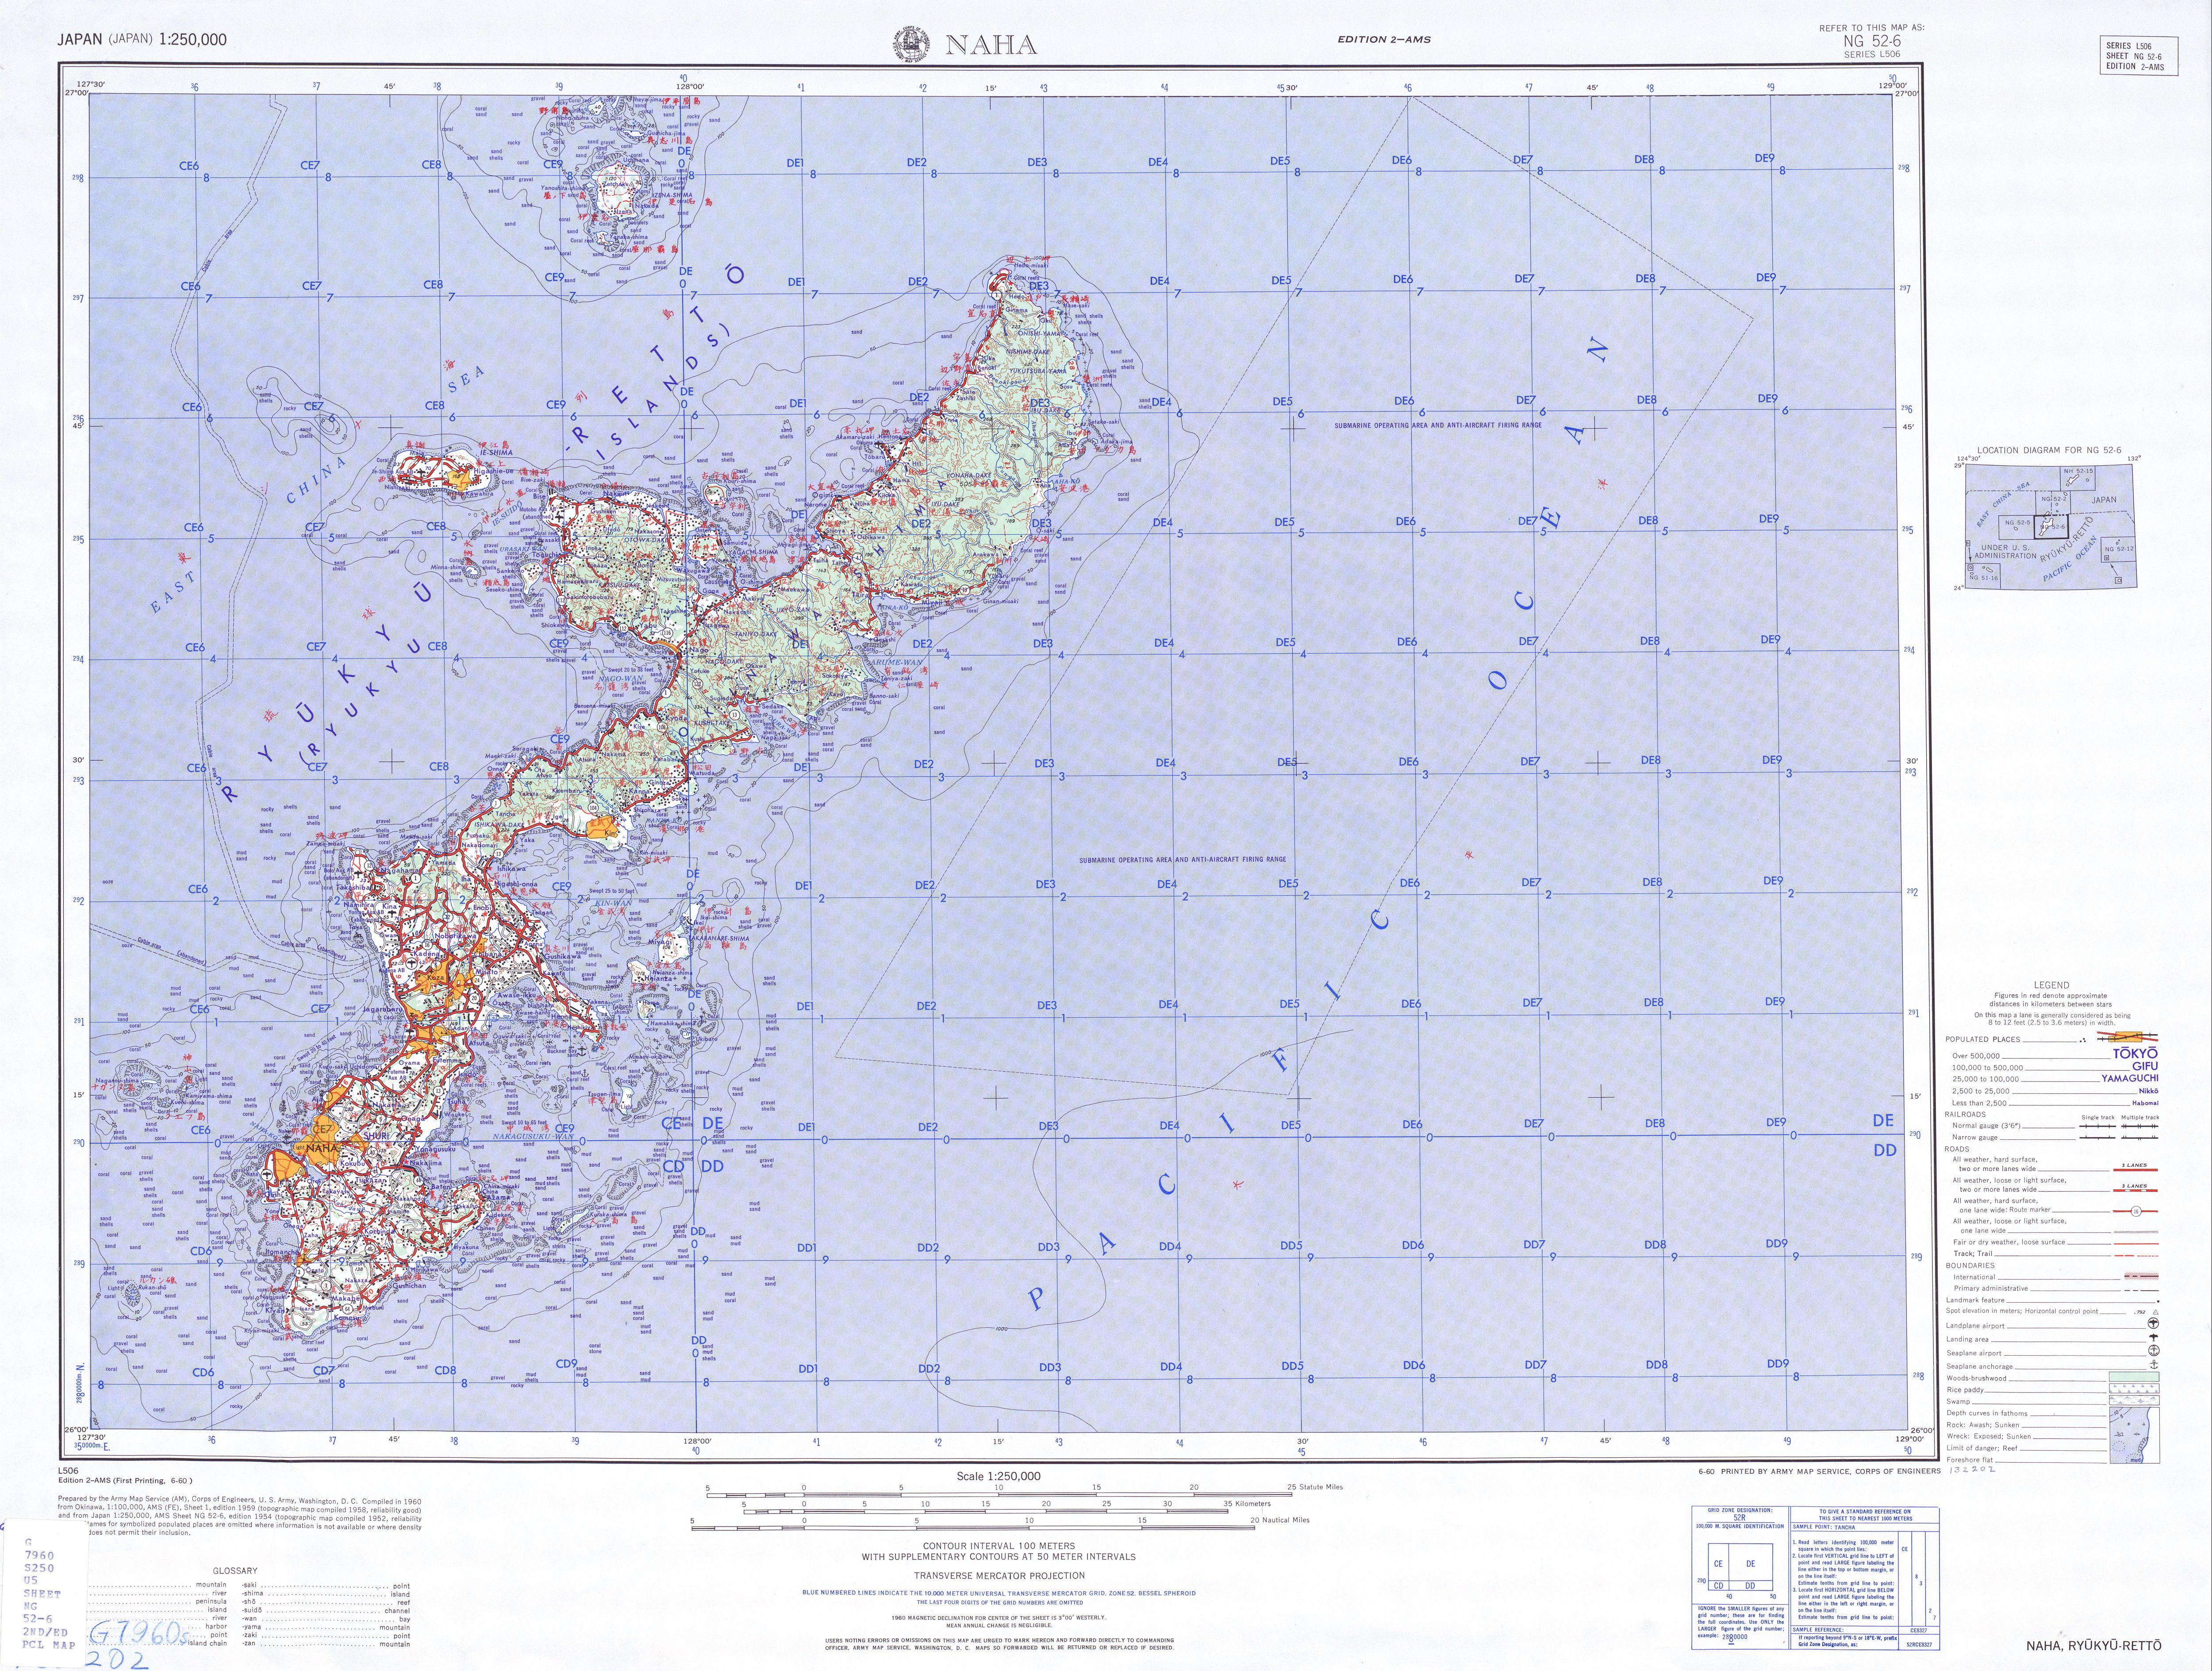 Naha Topographic Map Sheet, Japan 1954